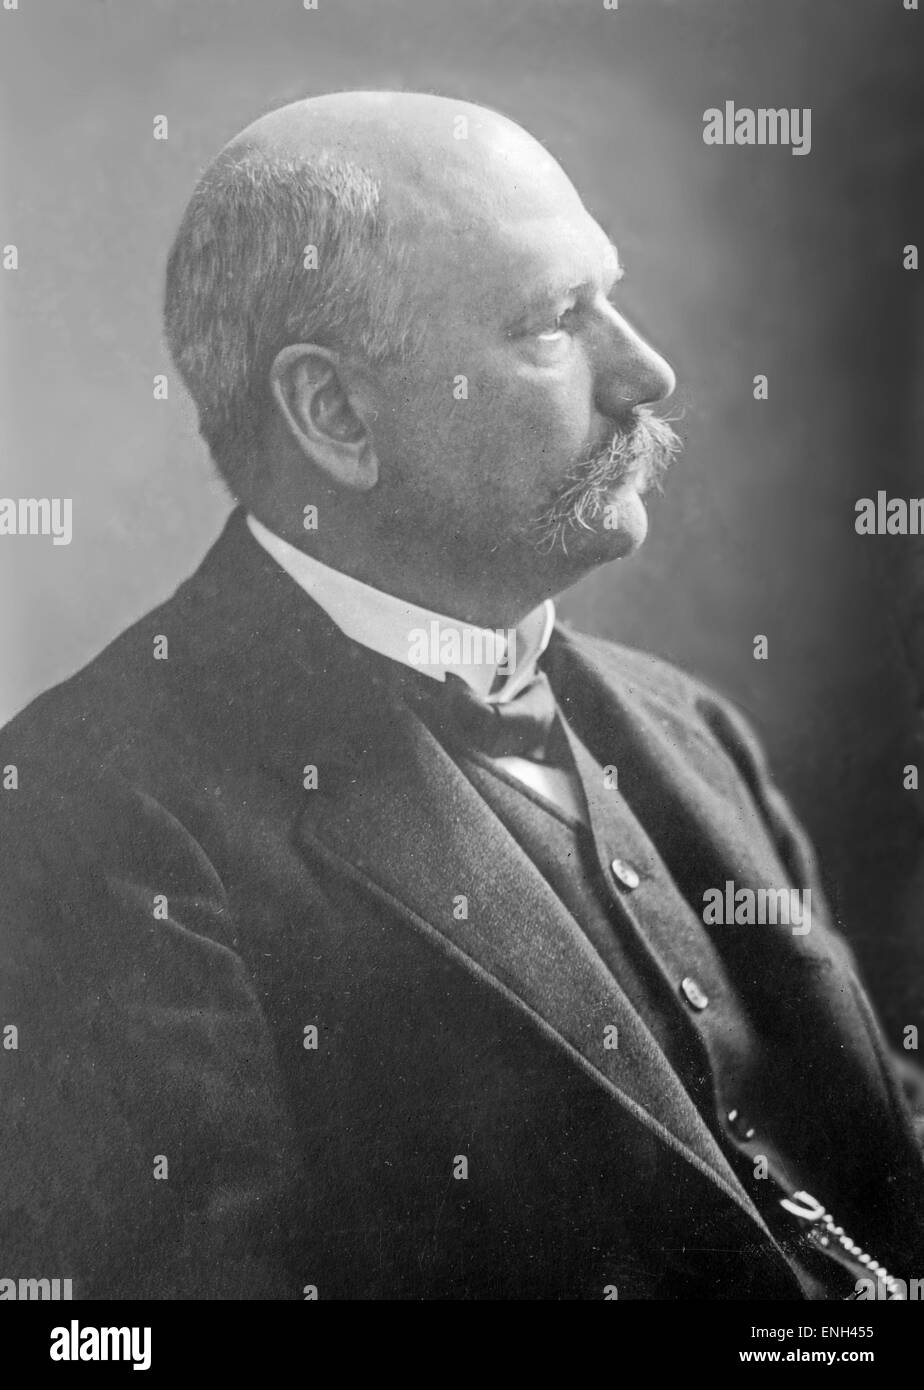 Albrecht Kossel, Ludwig Karl Martin Leonhard Albrecht Kossel, Gewinner des Nobelpreises für Physiologie oder Stockbild